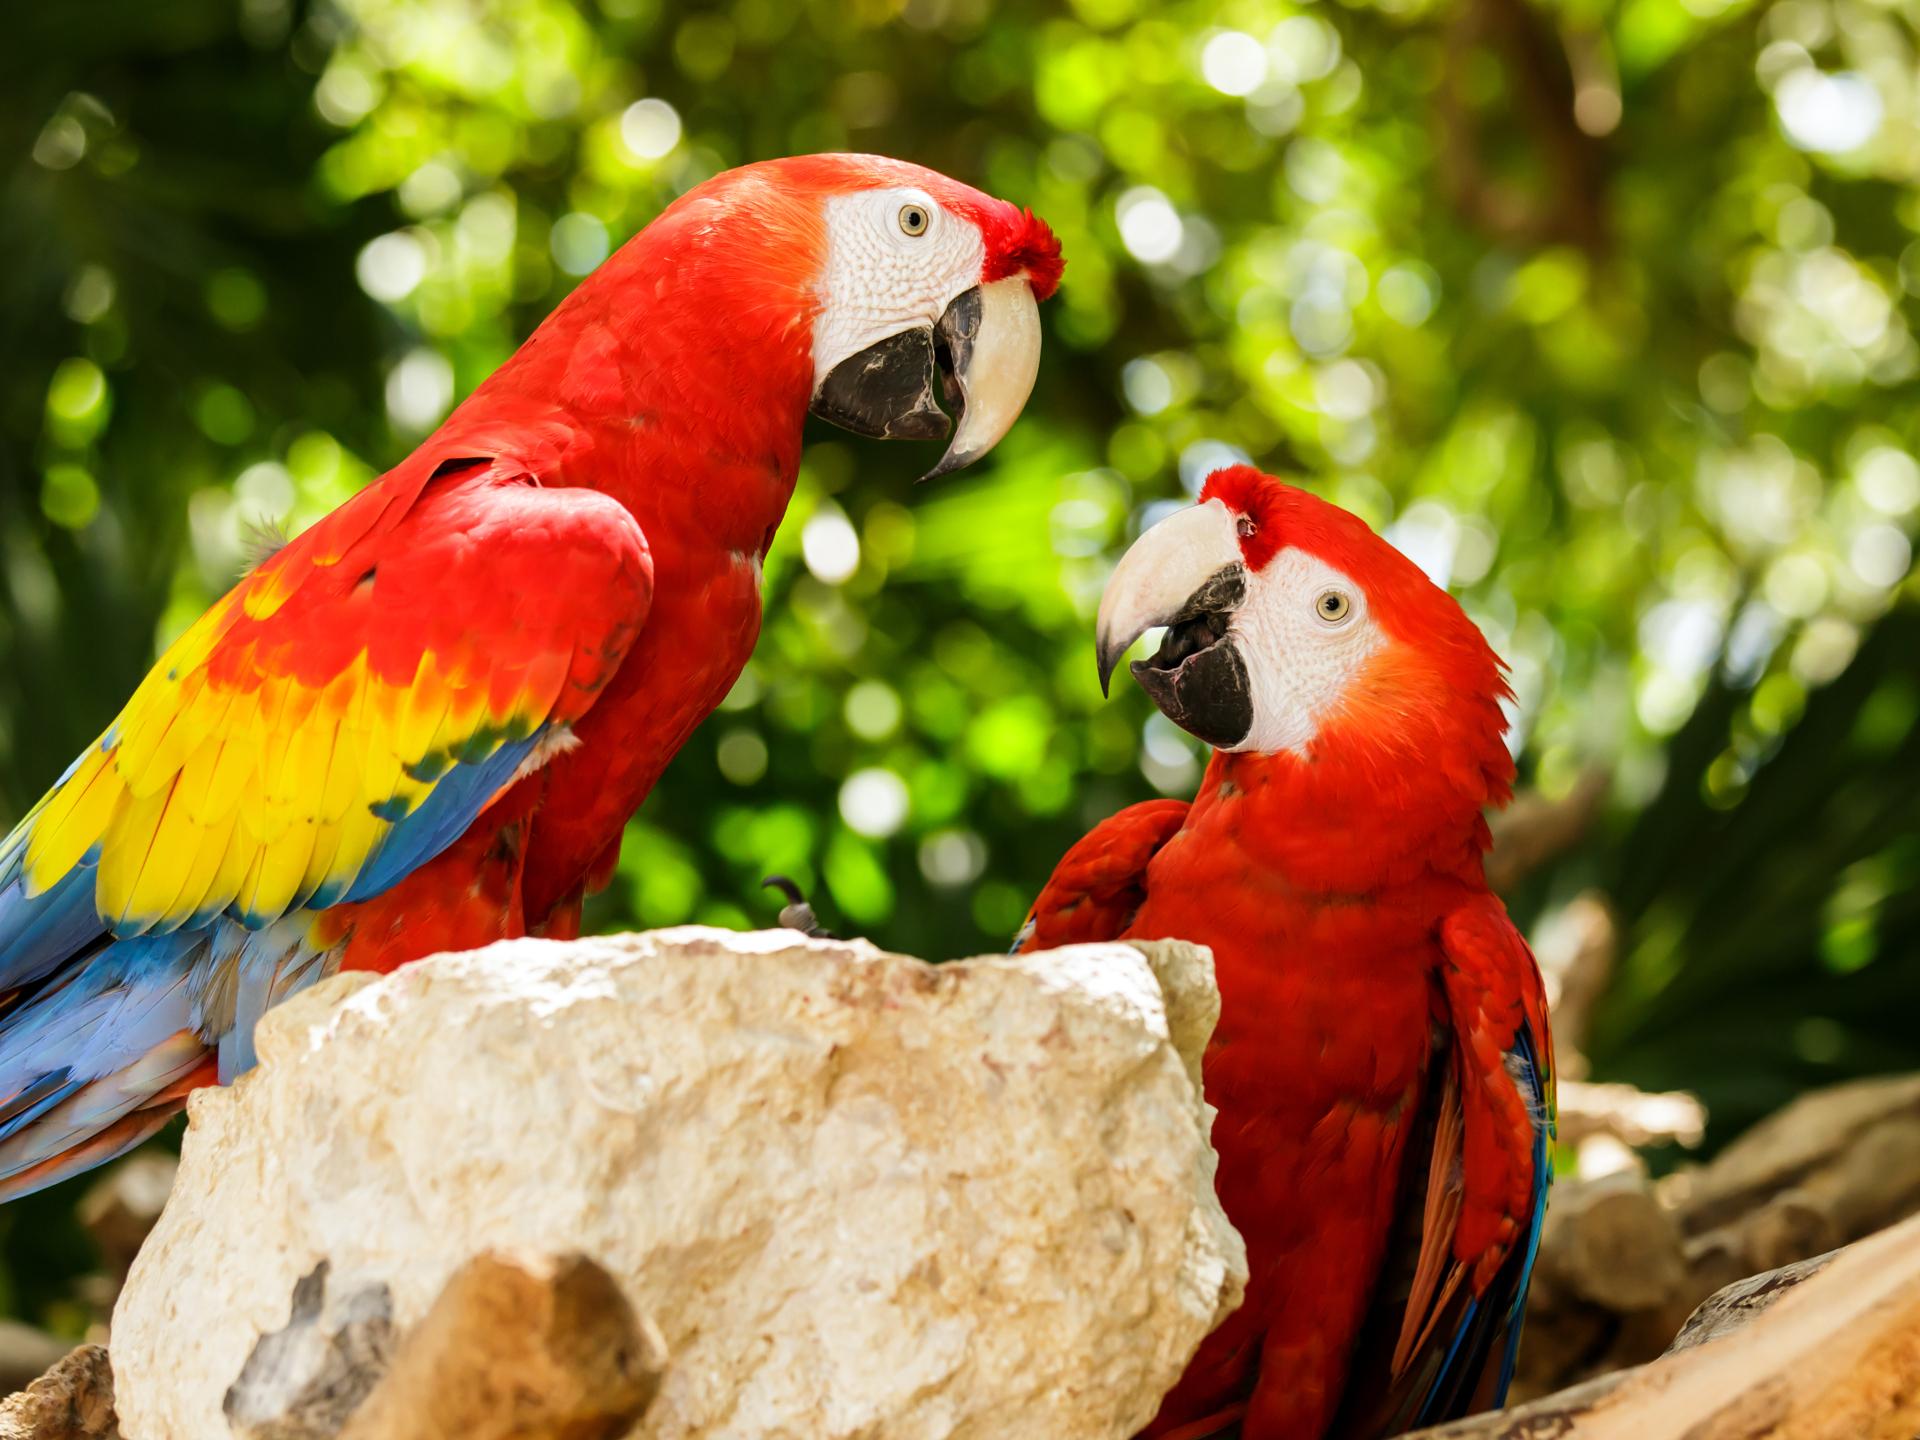 parrot-florida-bird-rescue-group-dfjd